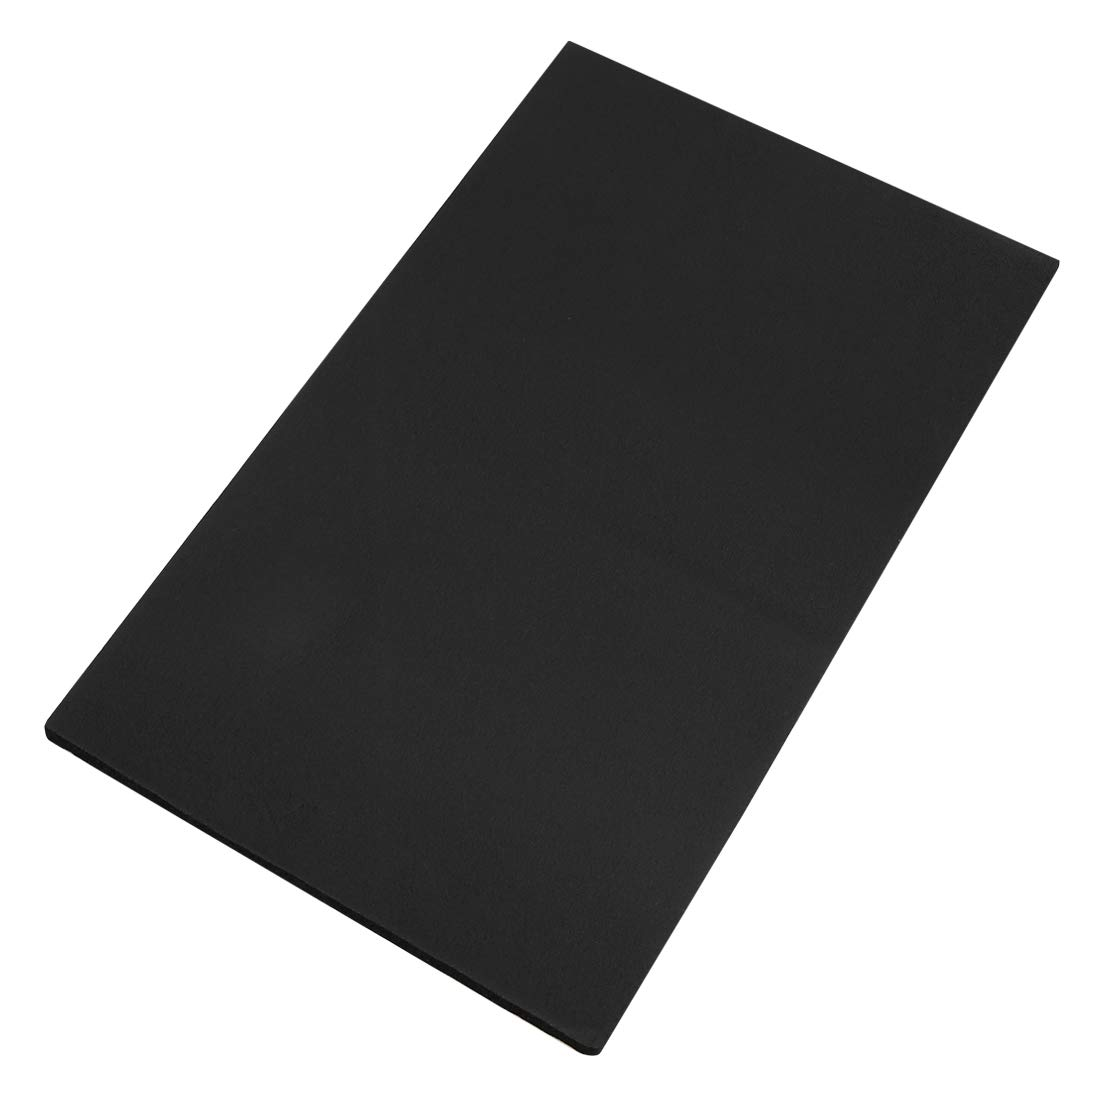 uxcell 315mil//8mm 1.6sqft Sound Deadening Noise Deadener Insulation Mat Cotton Blends Acoustic Barrier 20x12inch//50x30cm